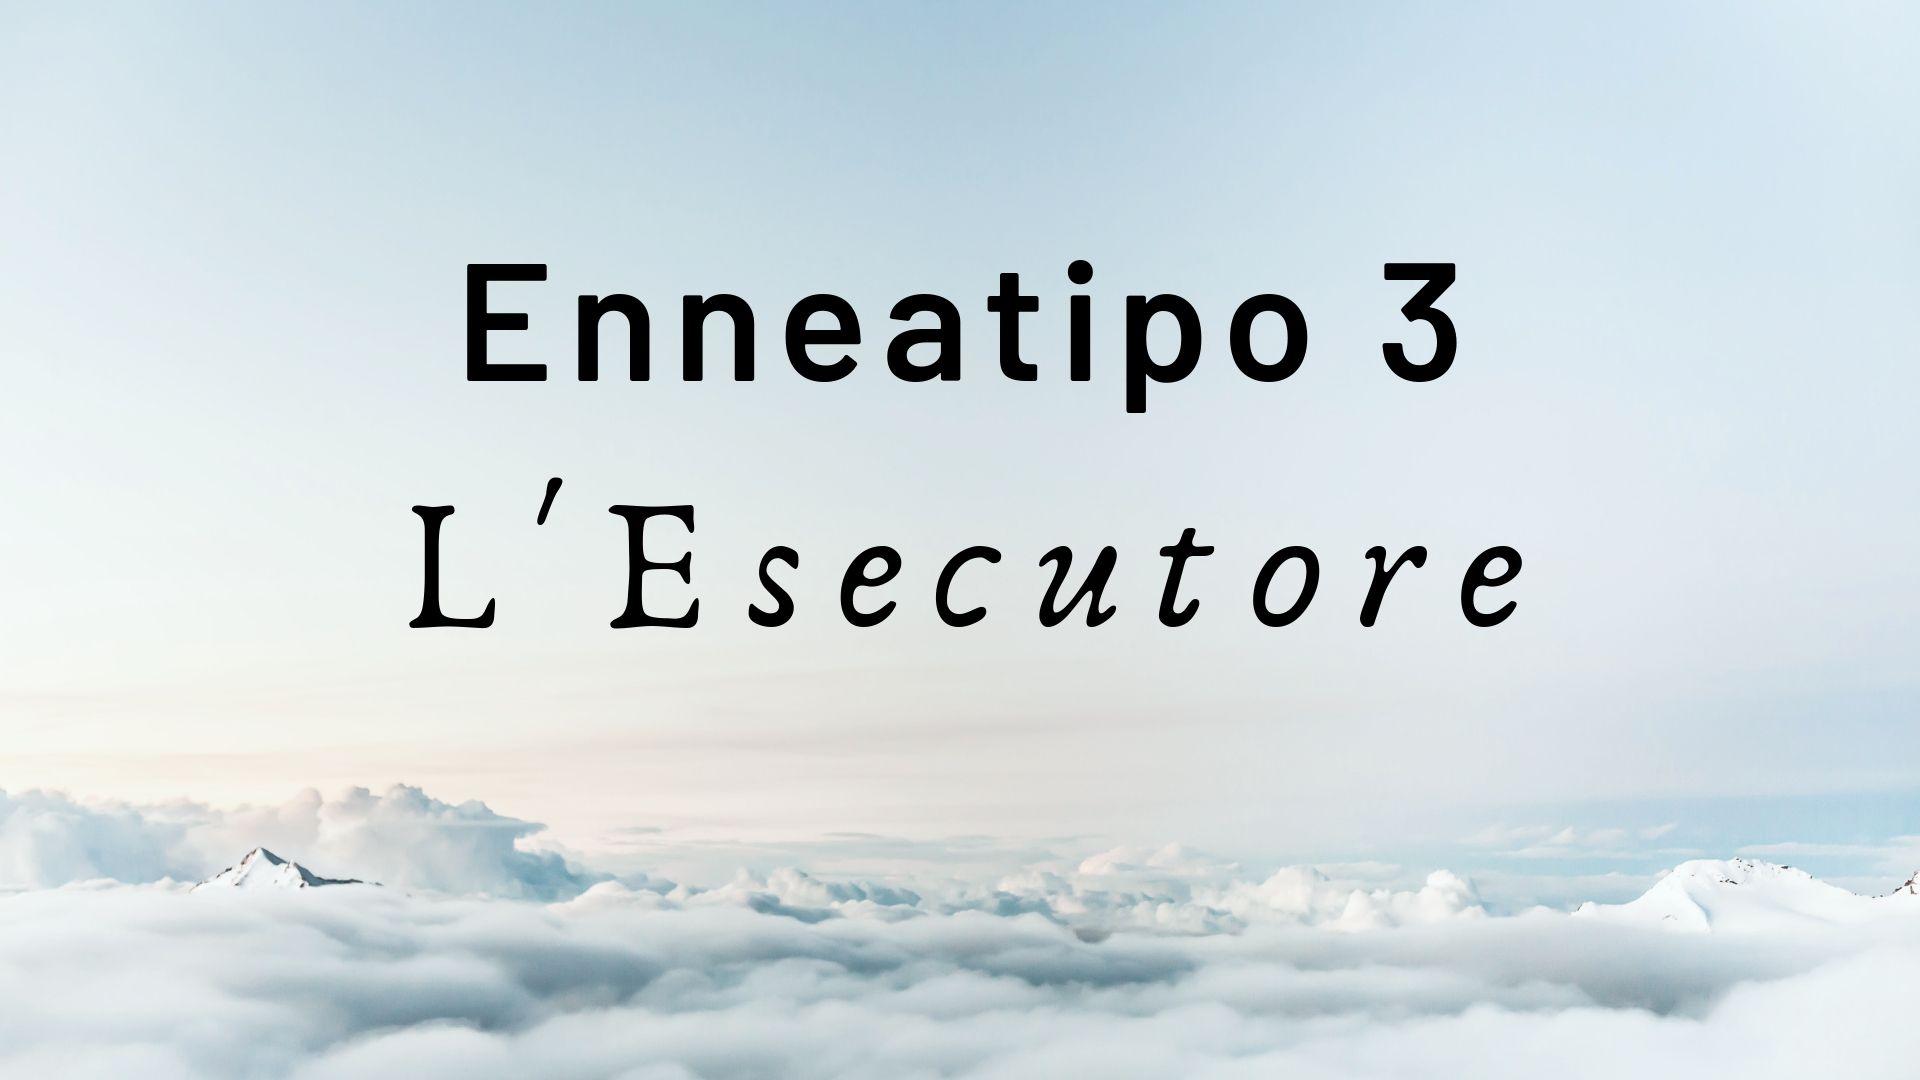 Enneatipo 3